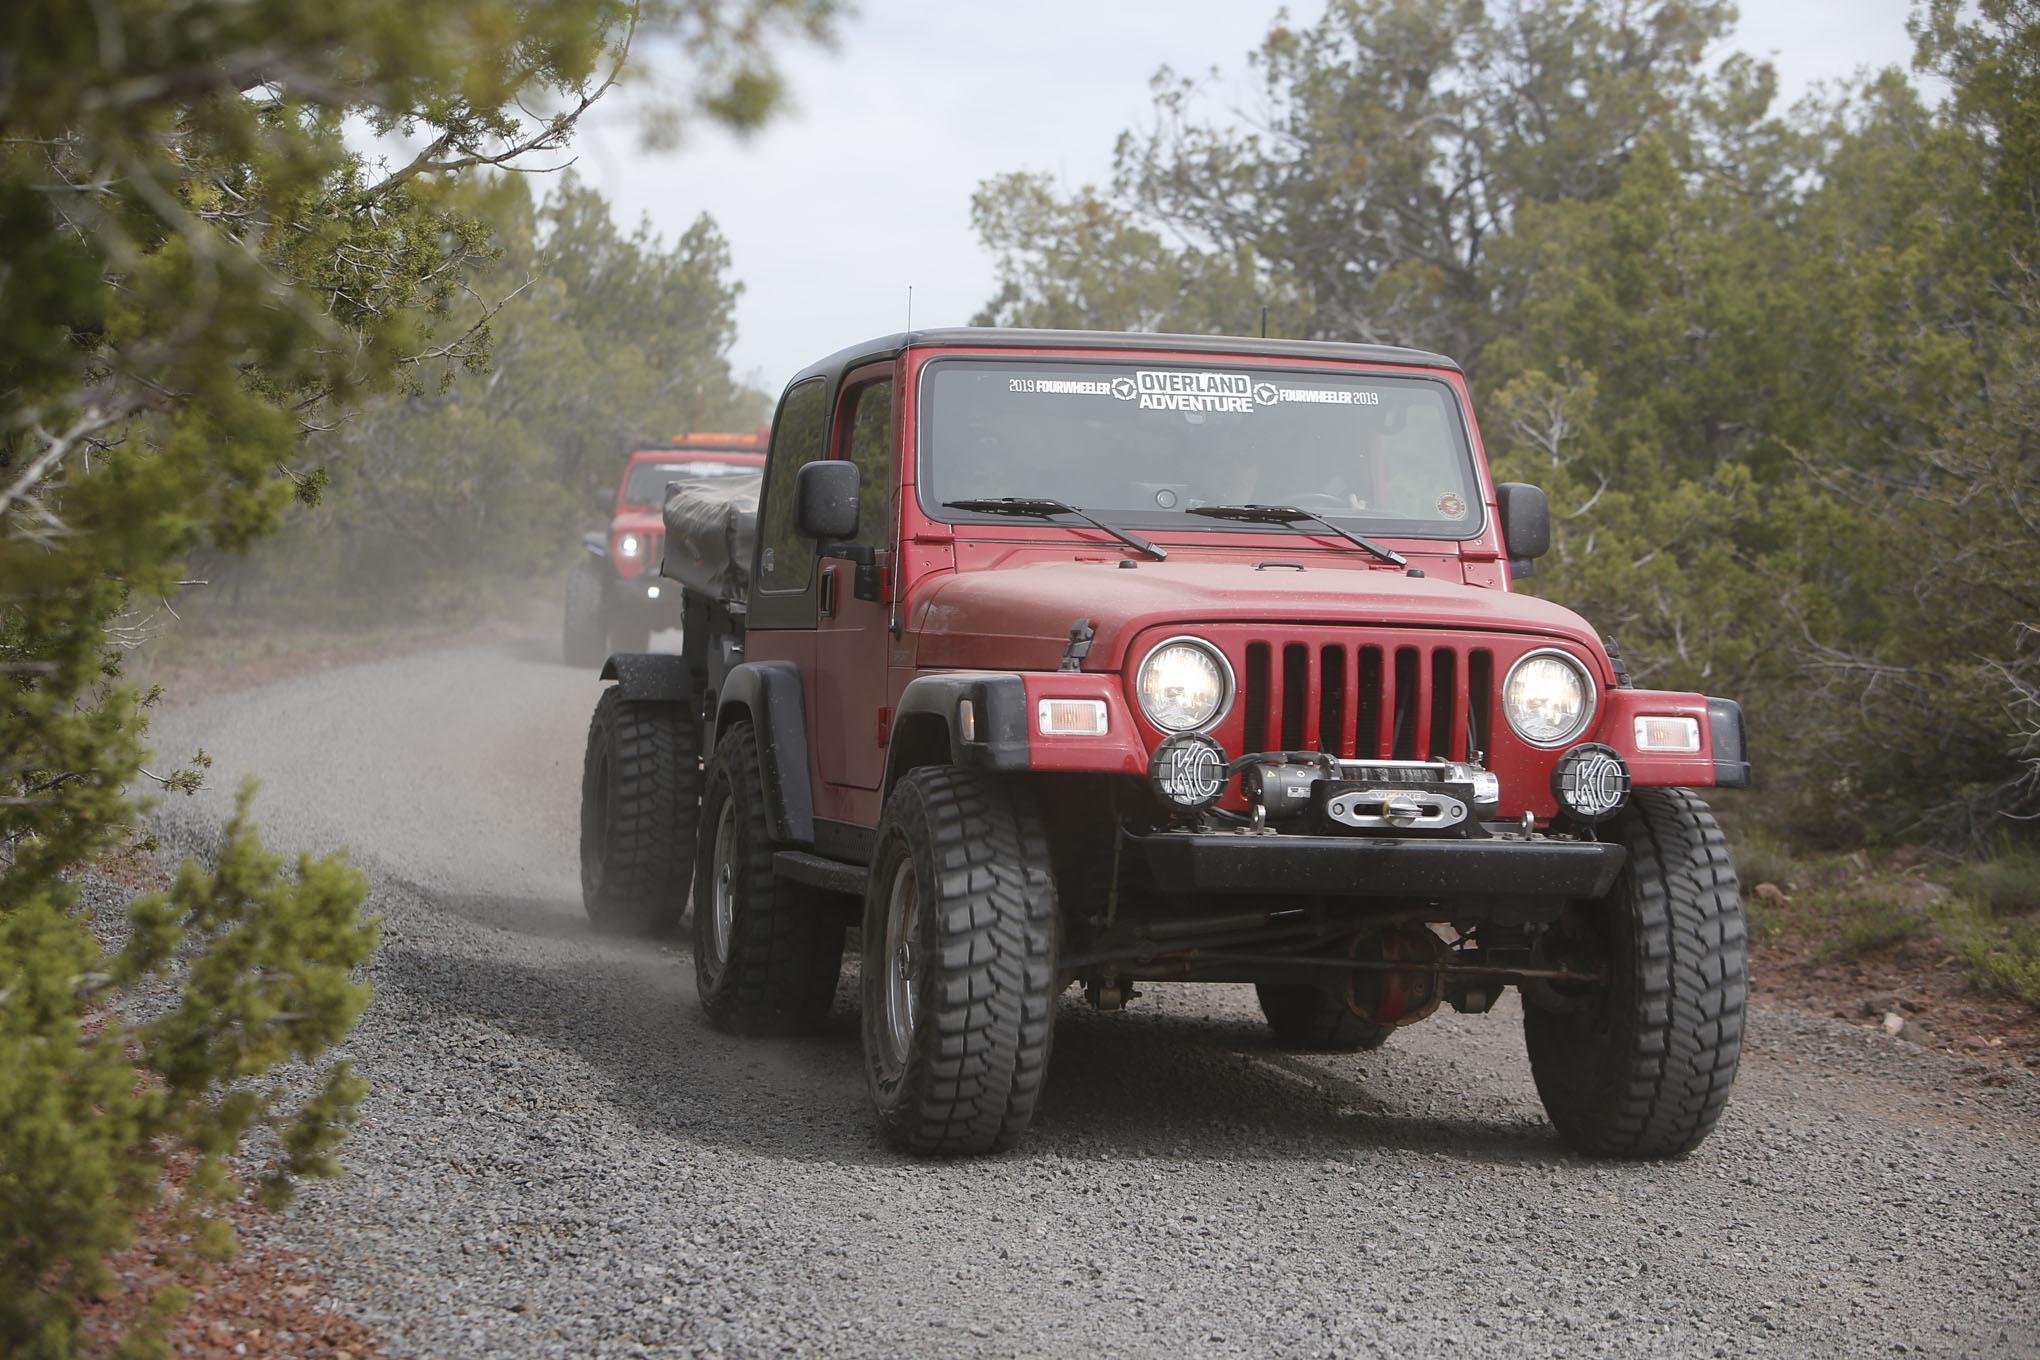 029 four wheeler aaron meyer 2006 jeep wrangler